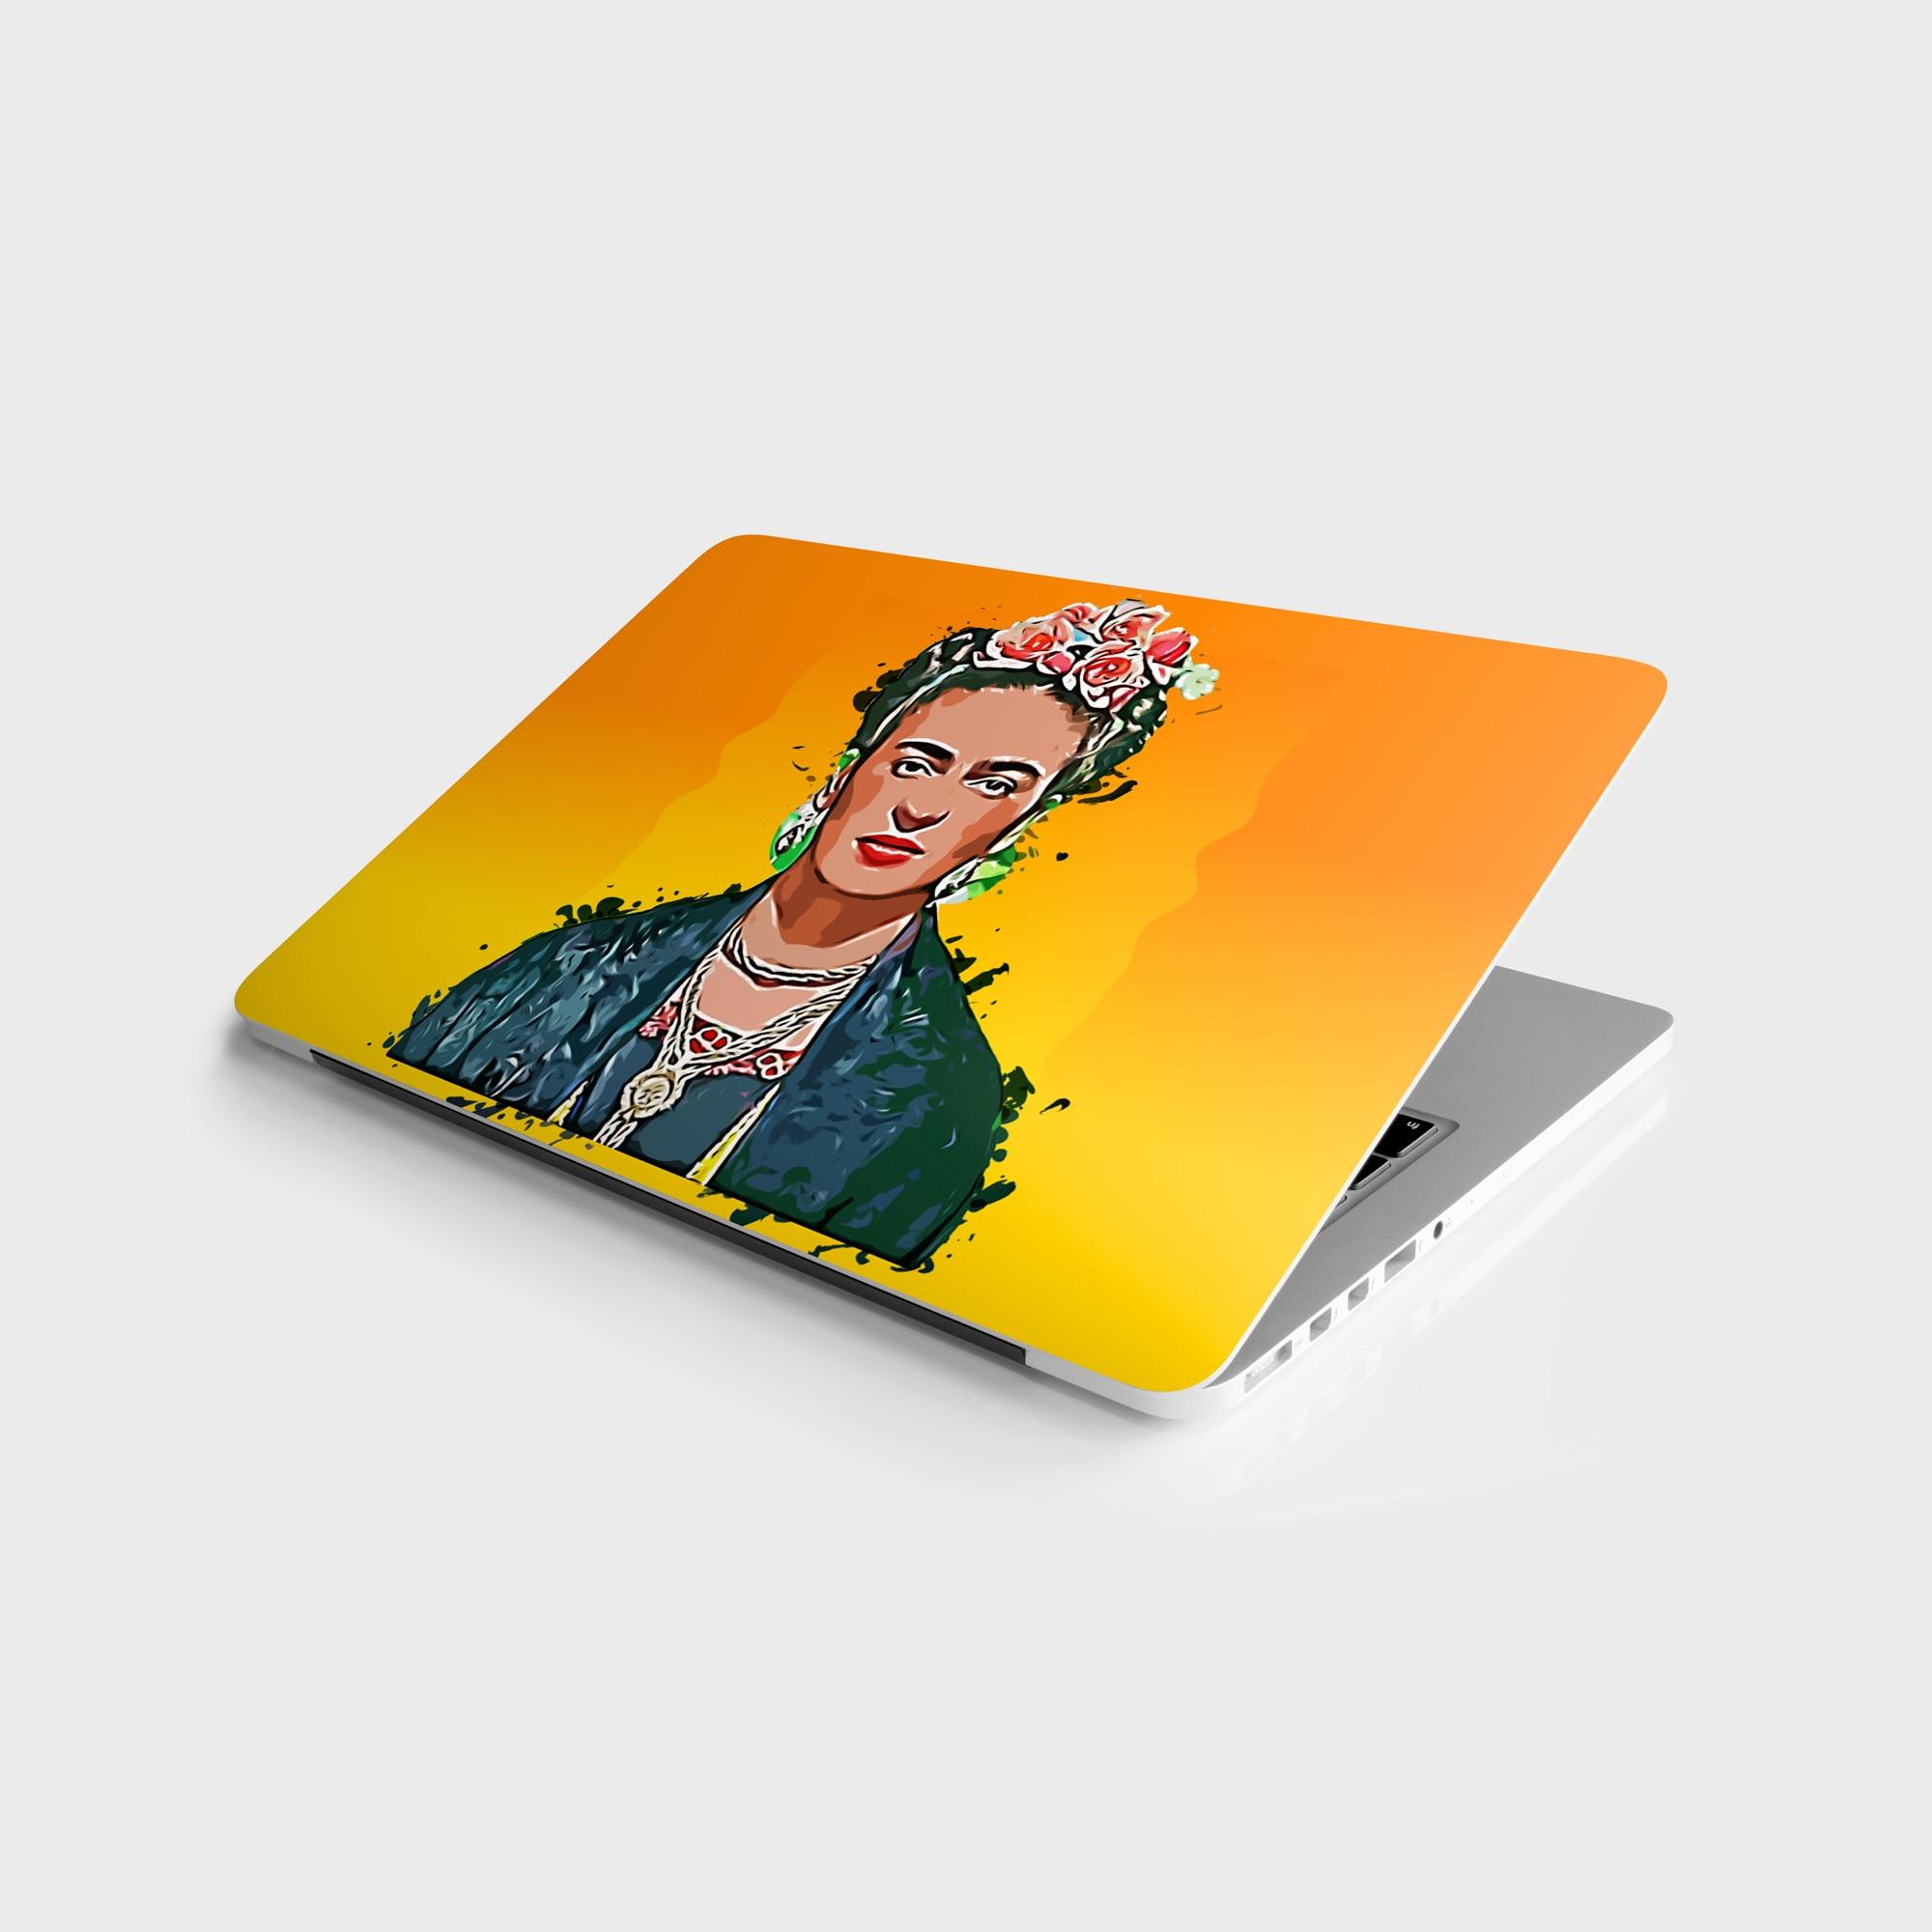 "Adesivo mestre frida kahlo etiqueta universal portátil vinil adesivo capa de pele para 10 12 13 14 15.4 15.6 16 17 19 ""inc notebook decalque para macbook, asus, acer, hp, lenovo, huawei, dell, msi, apple, toshiba, compaq"